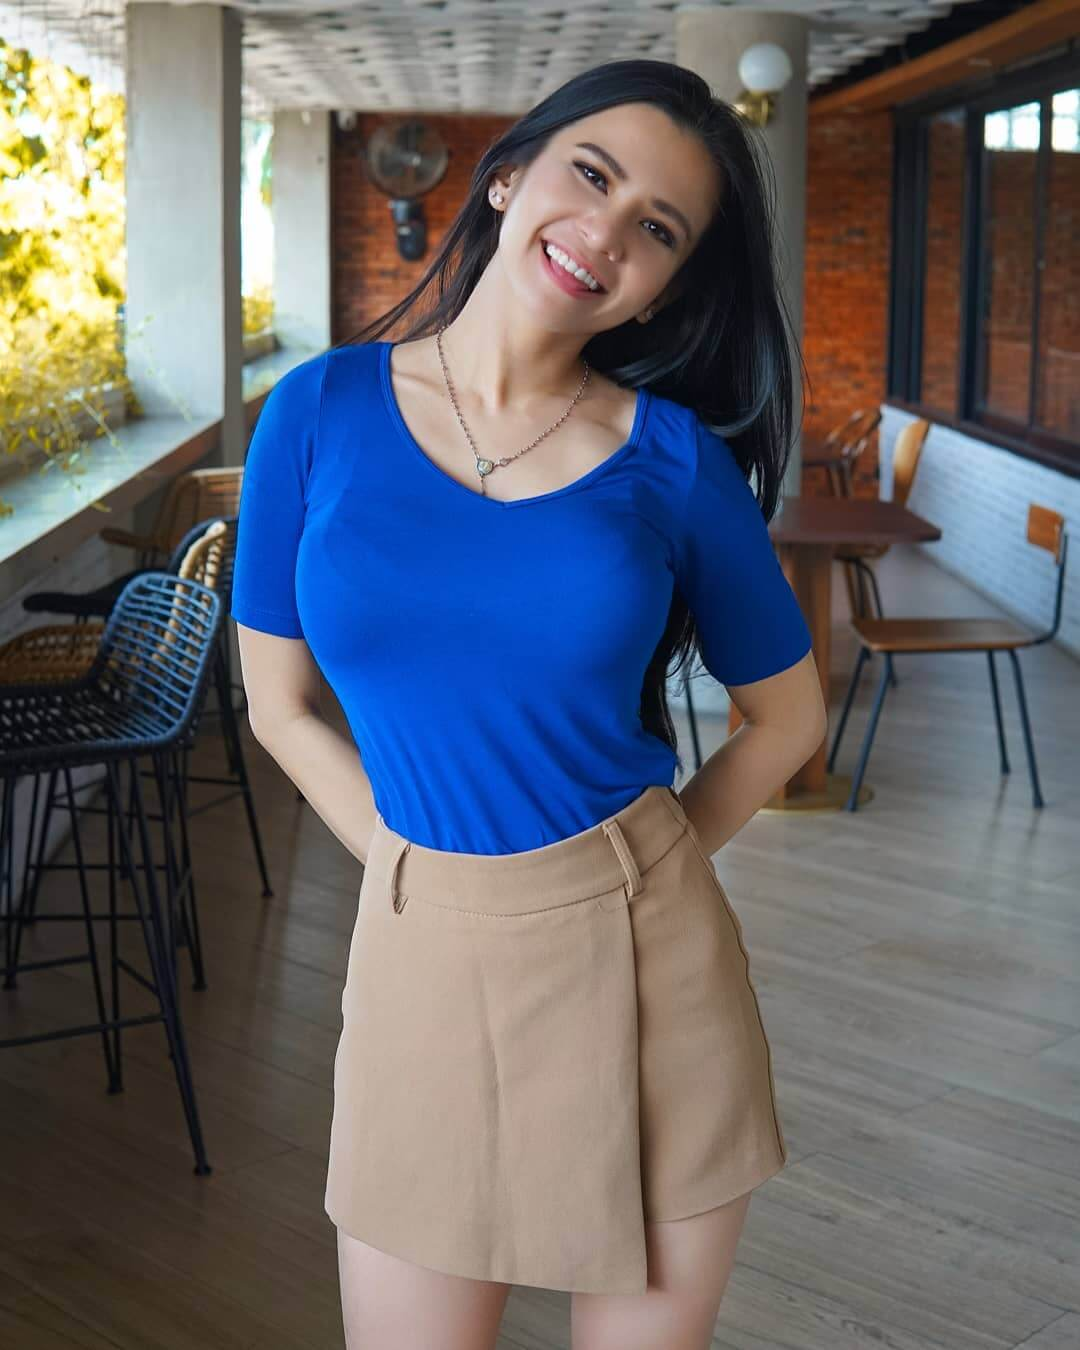 Maria Vania In Blue Top